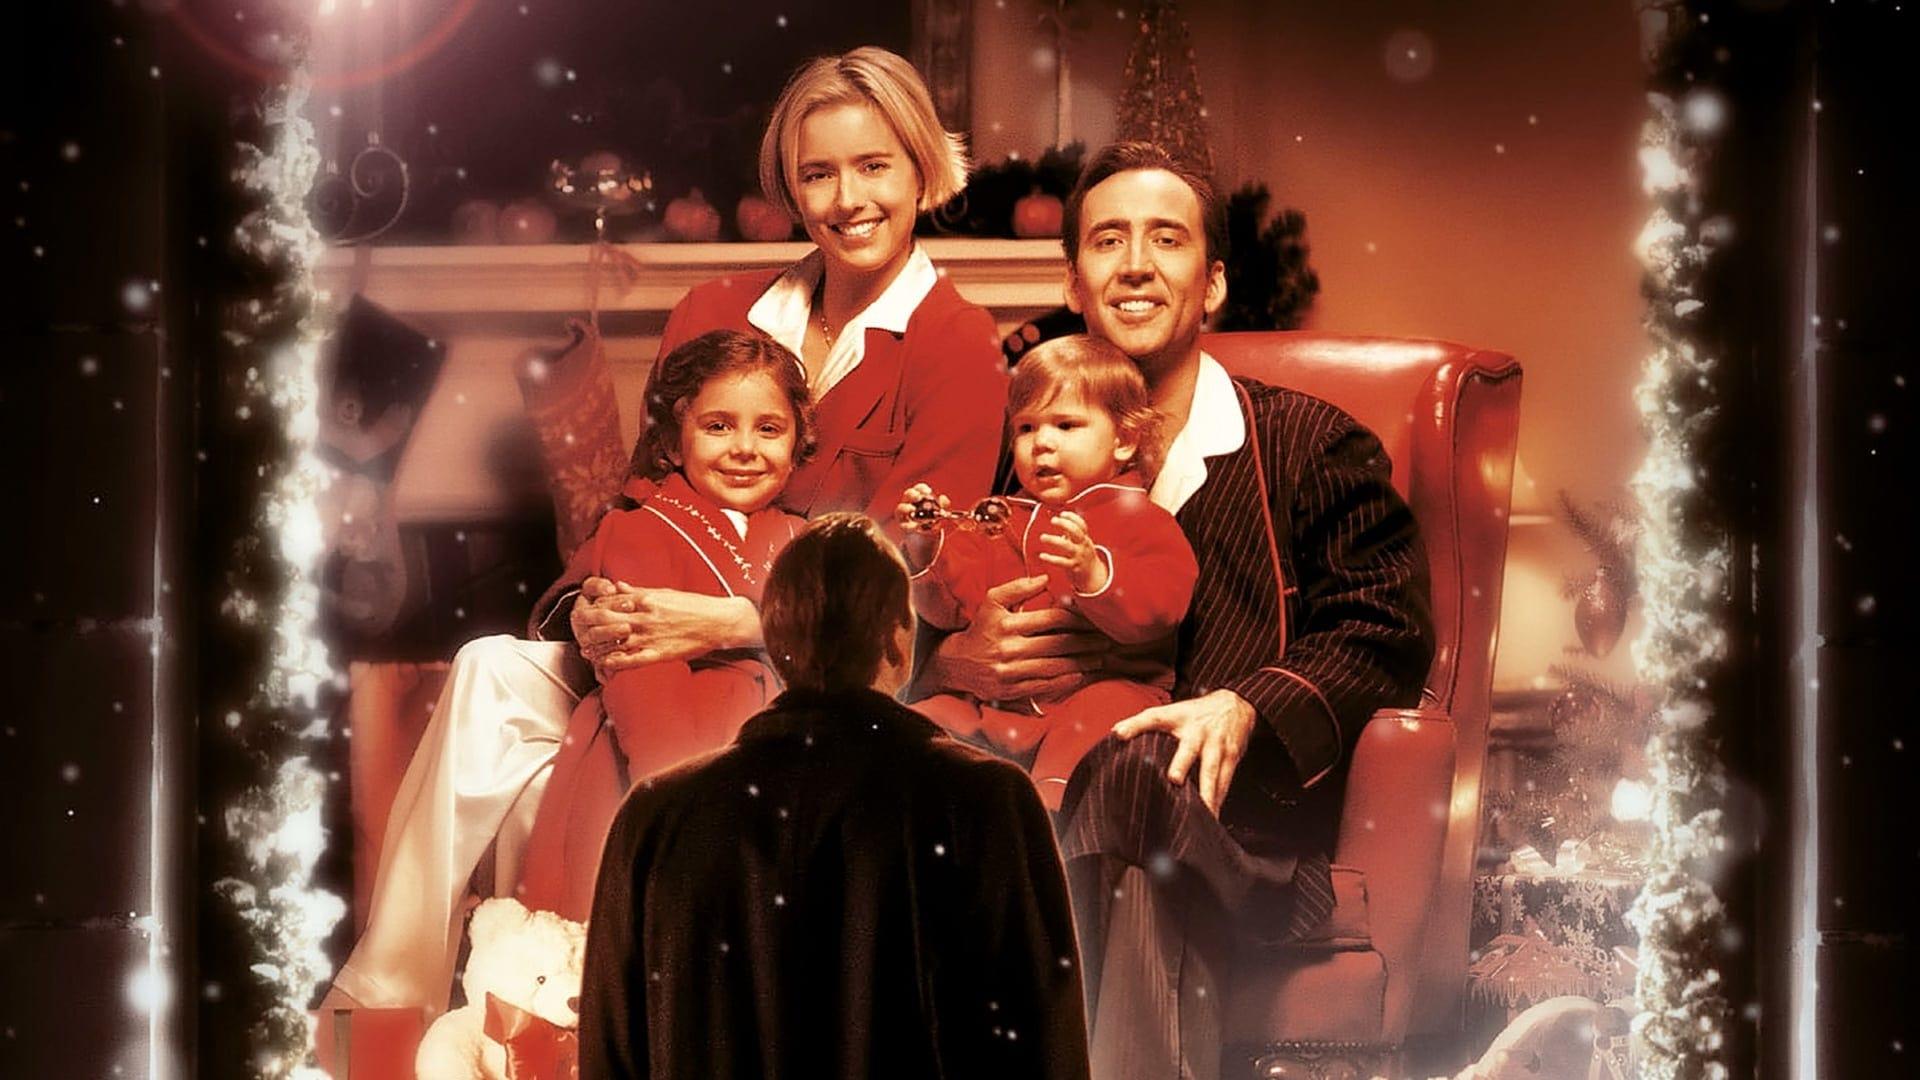 The Family Man Movie